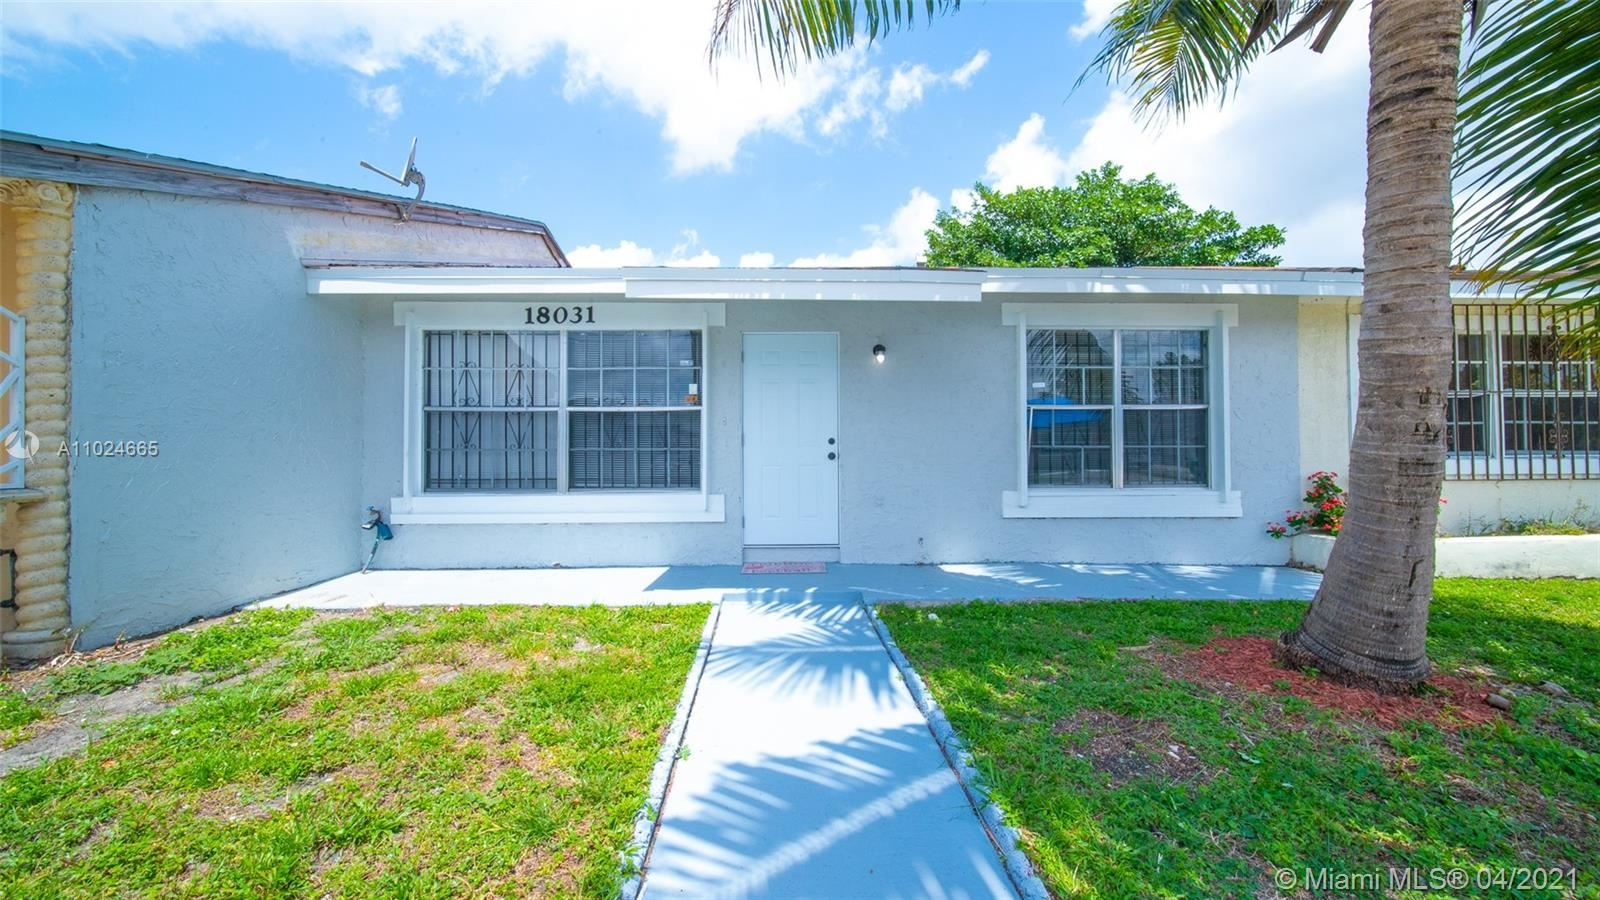 18031 NW 41st Pl, Miami Gardens, FL 33055 - #: A11024665